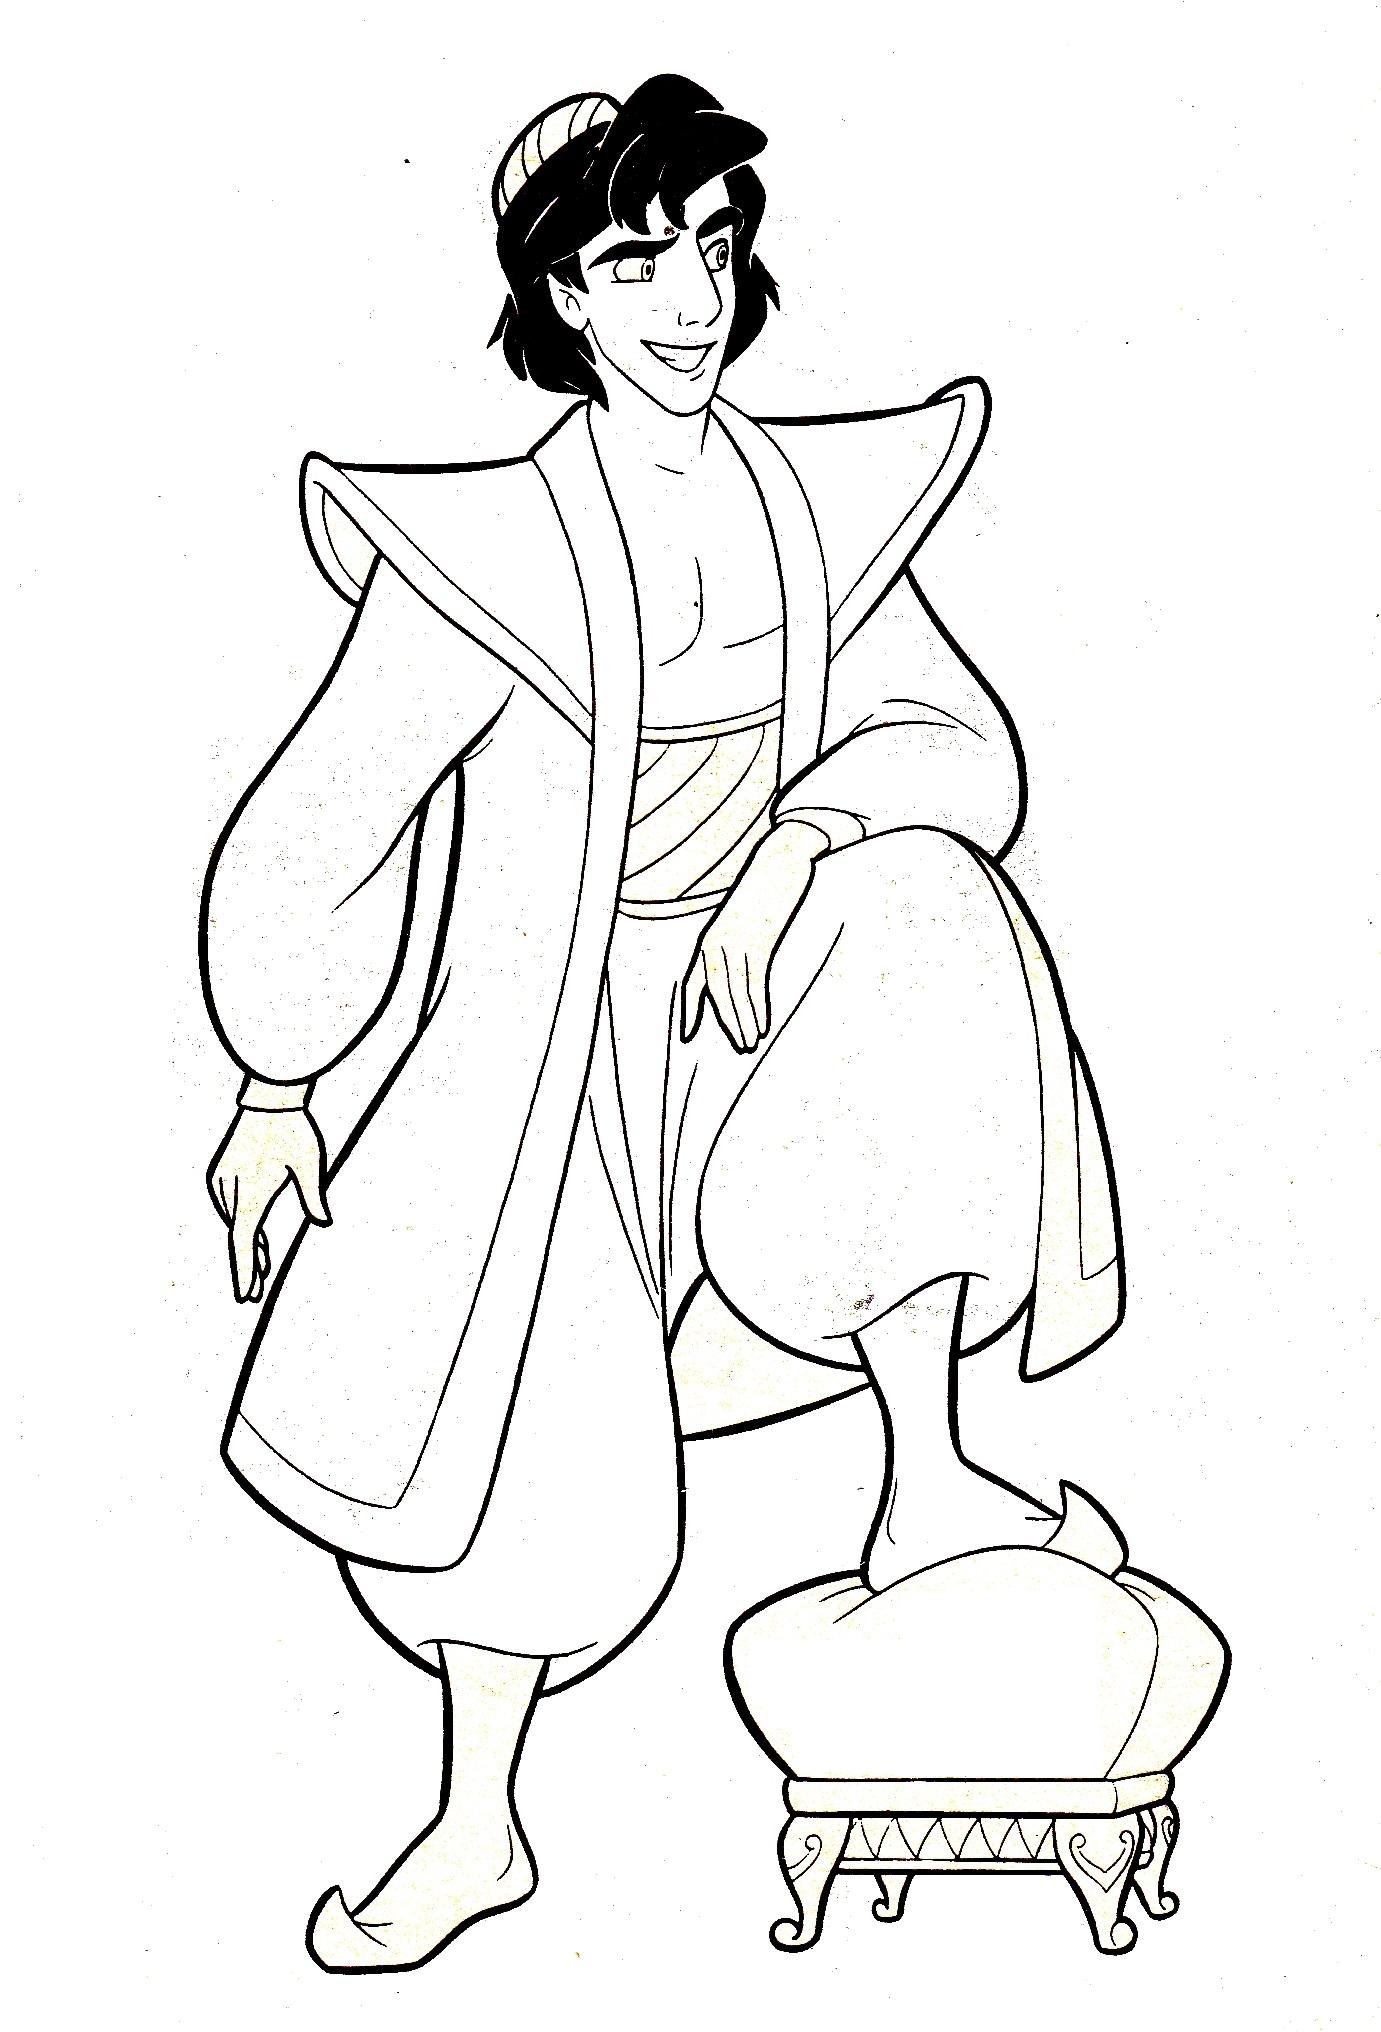 aladin coloring pages - coloriage prince aladdin imprimer